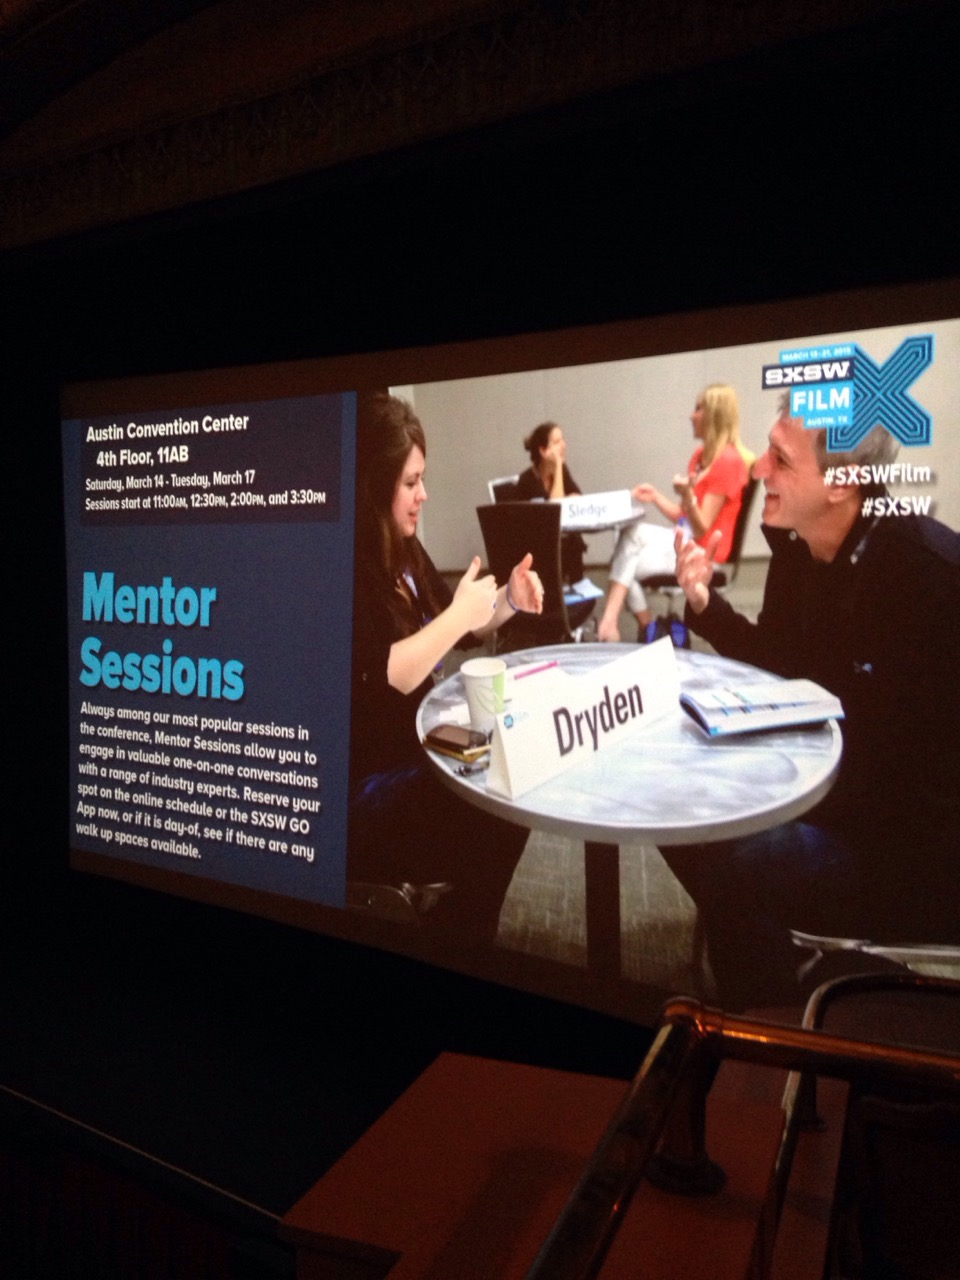 Lindsey mentoring SXSW-1.jpg